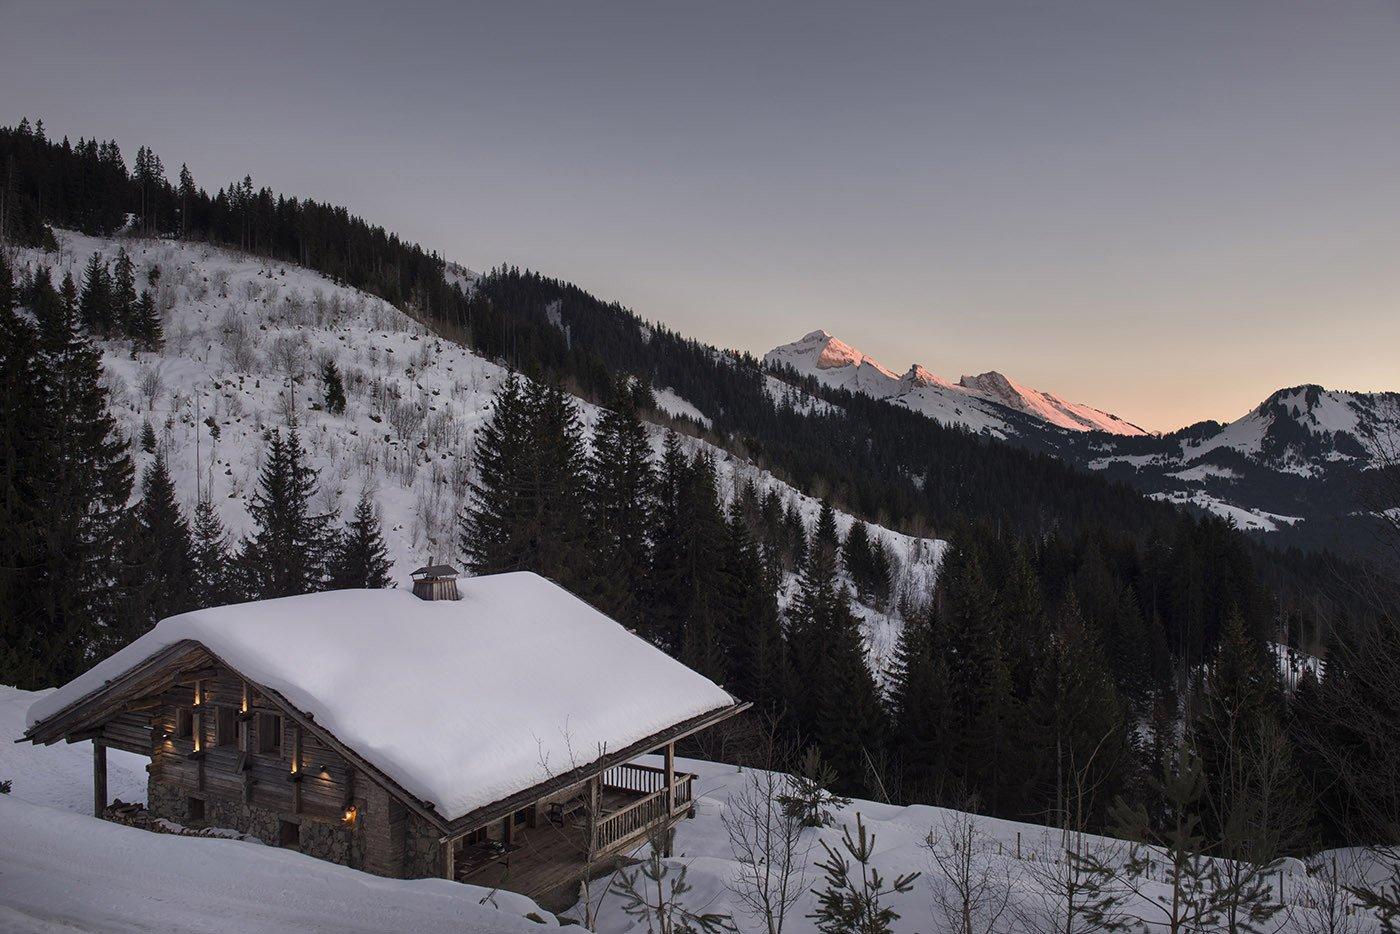 Sylvie Blanchet's chalet in the French Alps   Modern Winter Retreats by Aileen Kwun from Peak Season